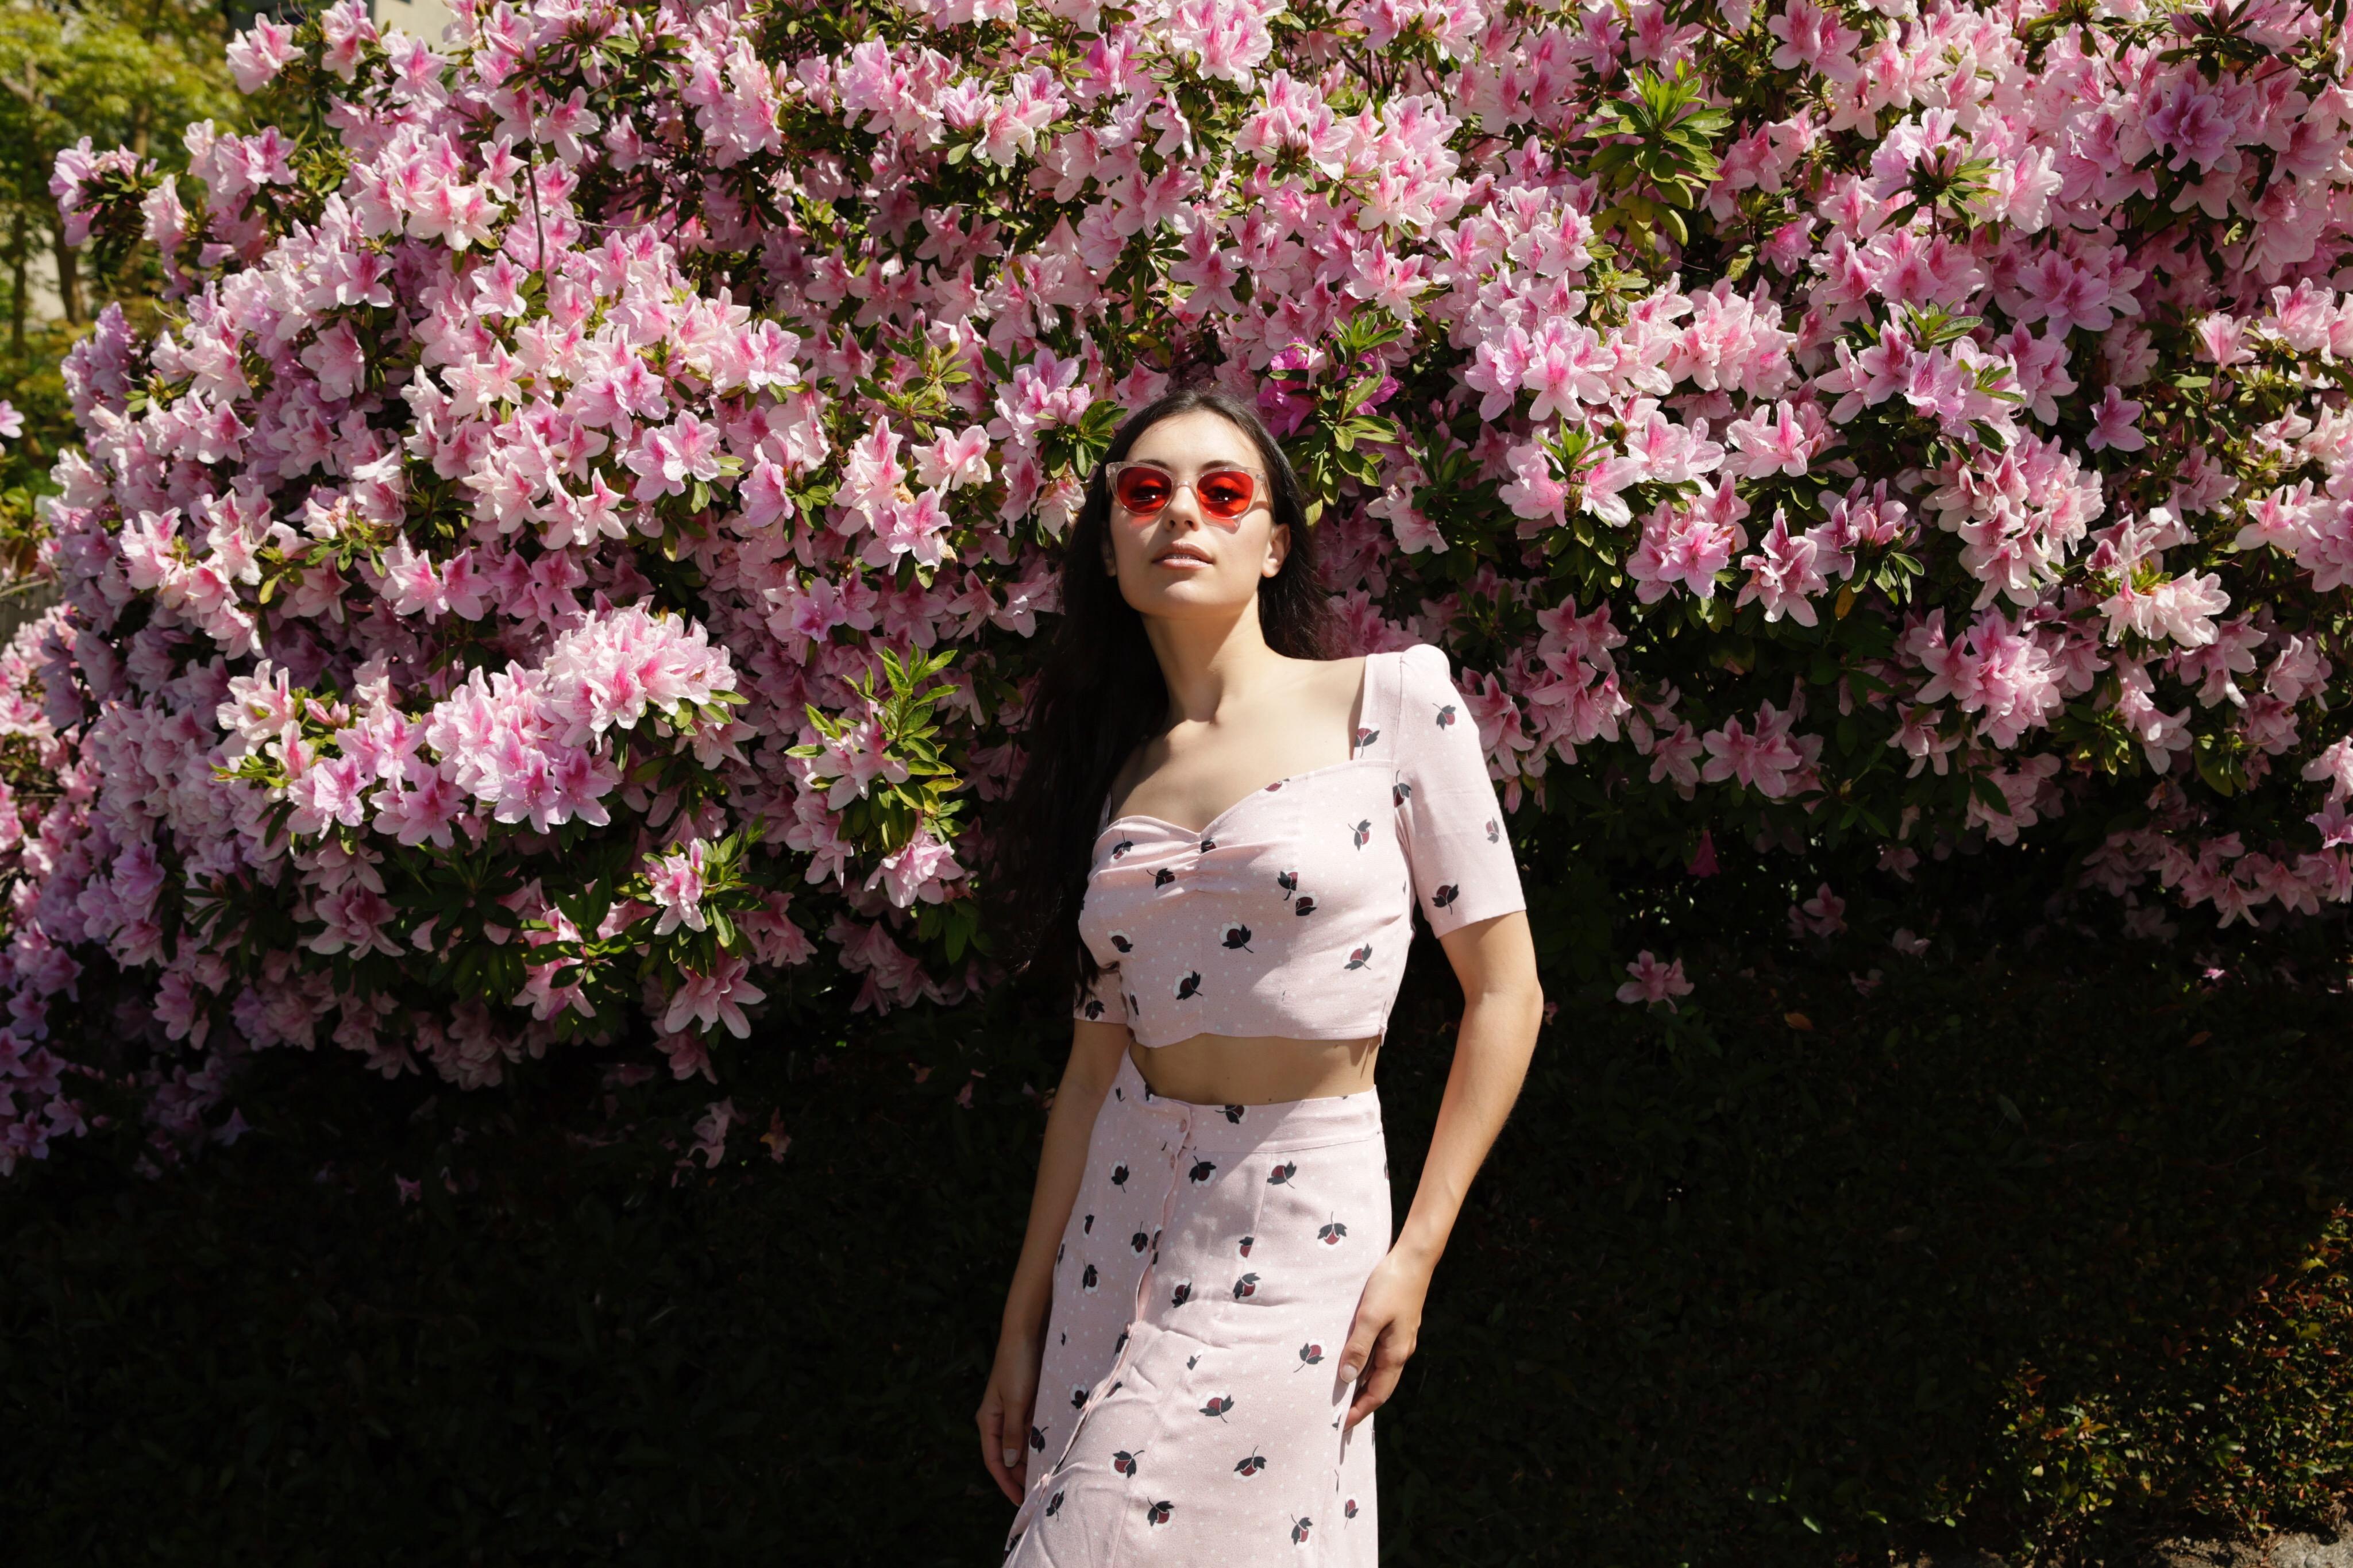 Marta Pozzan wearing a dress by & Other Stories LA